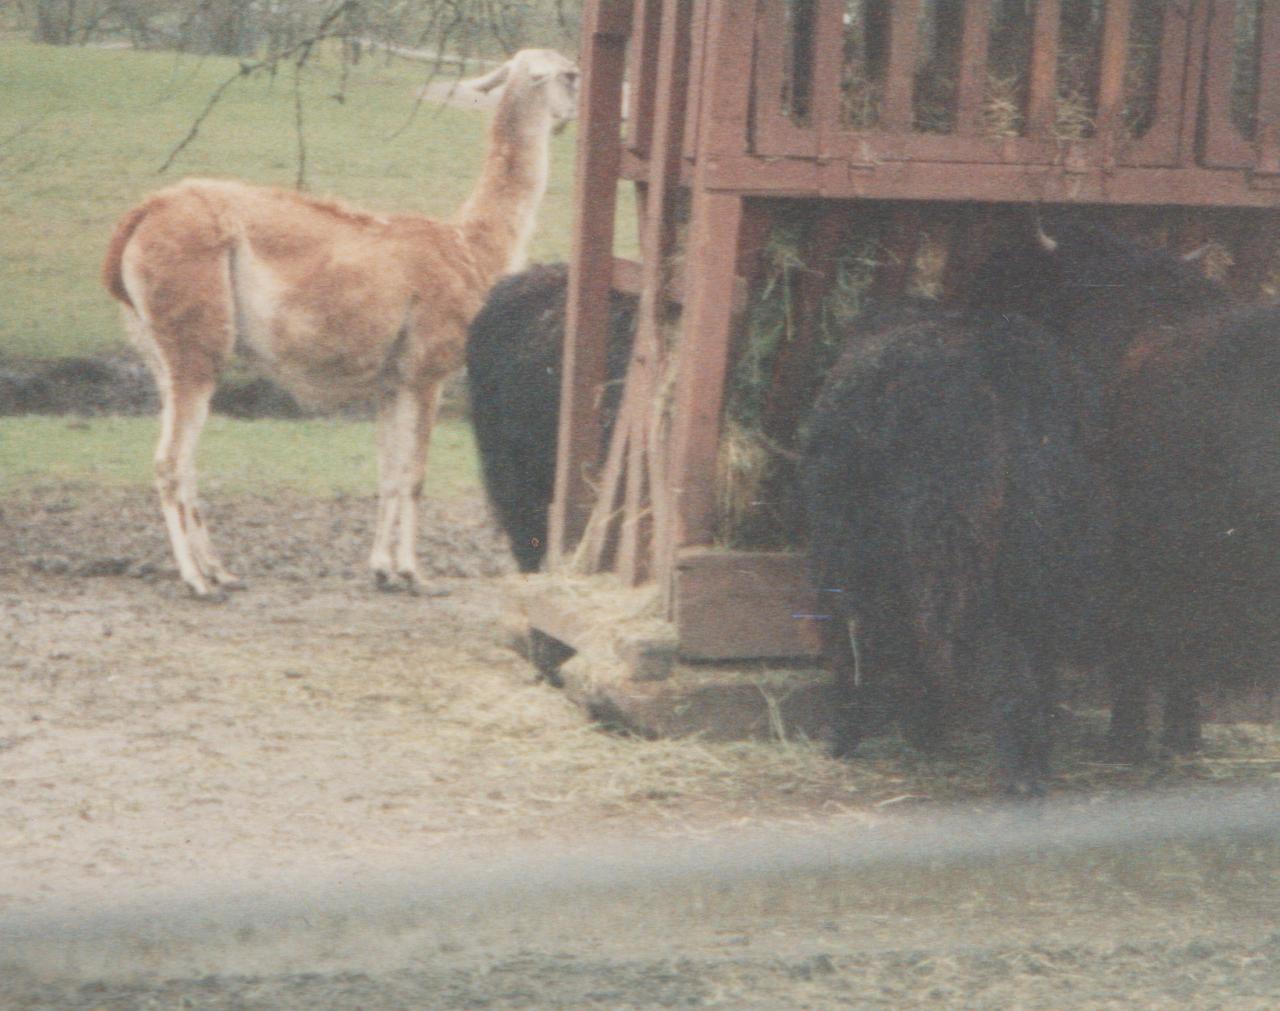 1992-12-26 - Saturday - Wildlife Safari Trip, Marilyn, Crystal-11.png